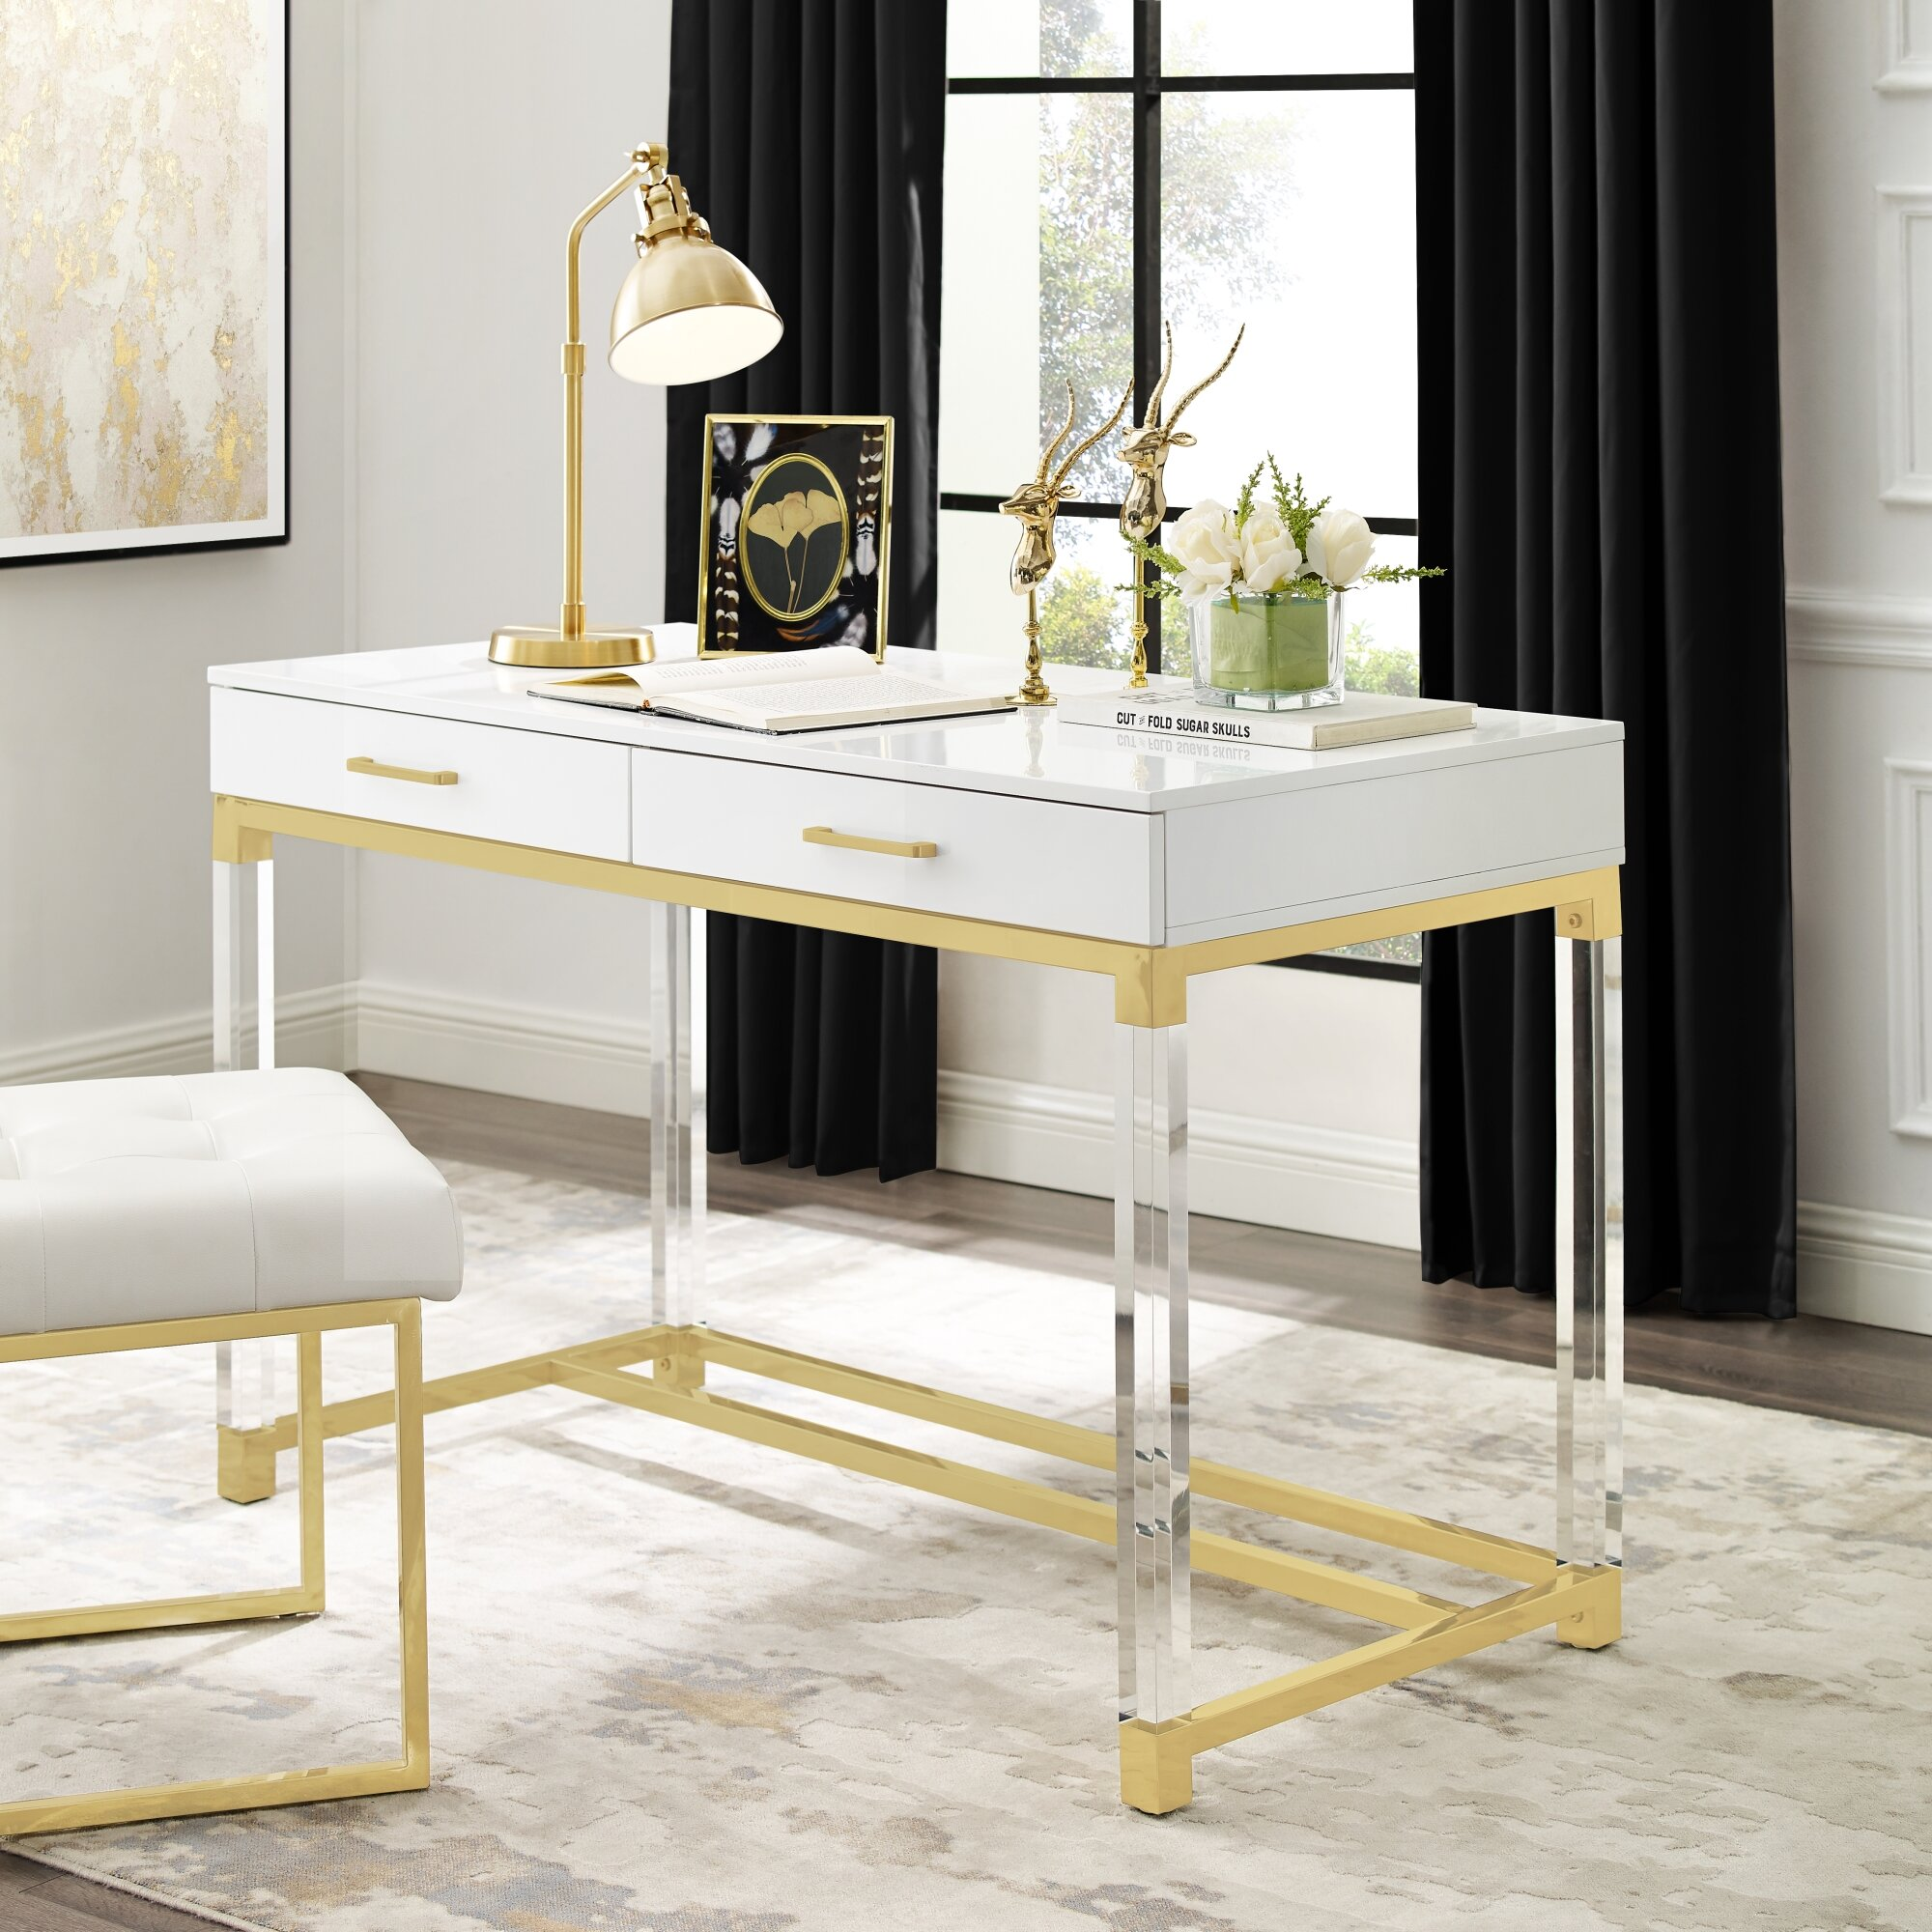 Incredible Leeann Writing Desk Andrewgaddart Wooden Chair Designs For Living Room Andrewgaddartcom